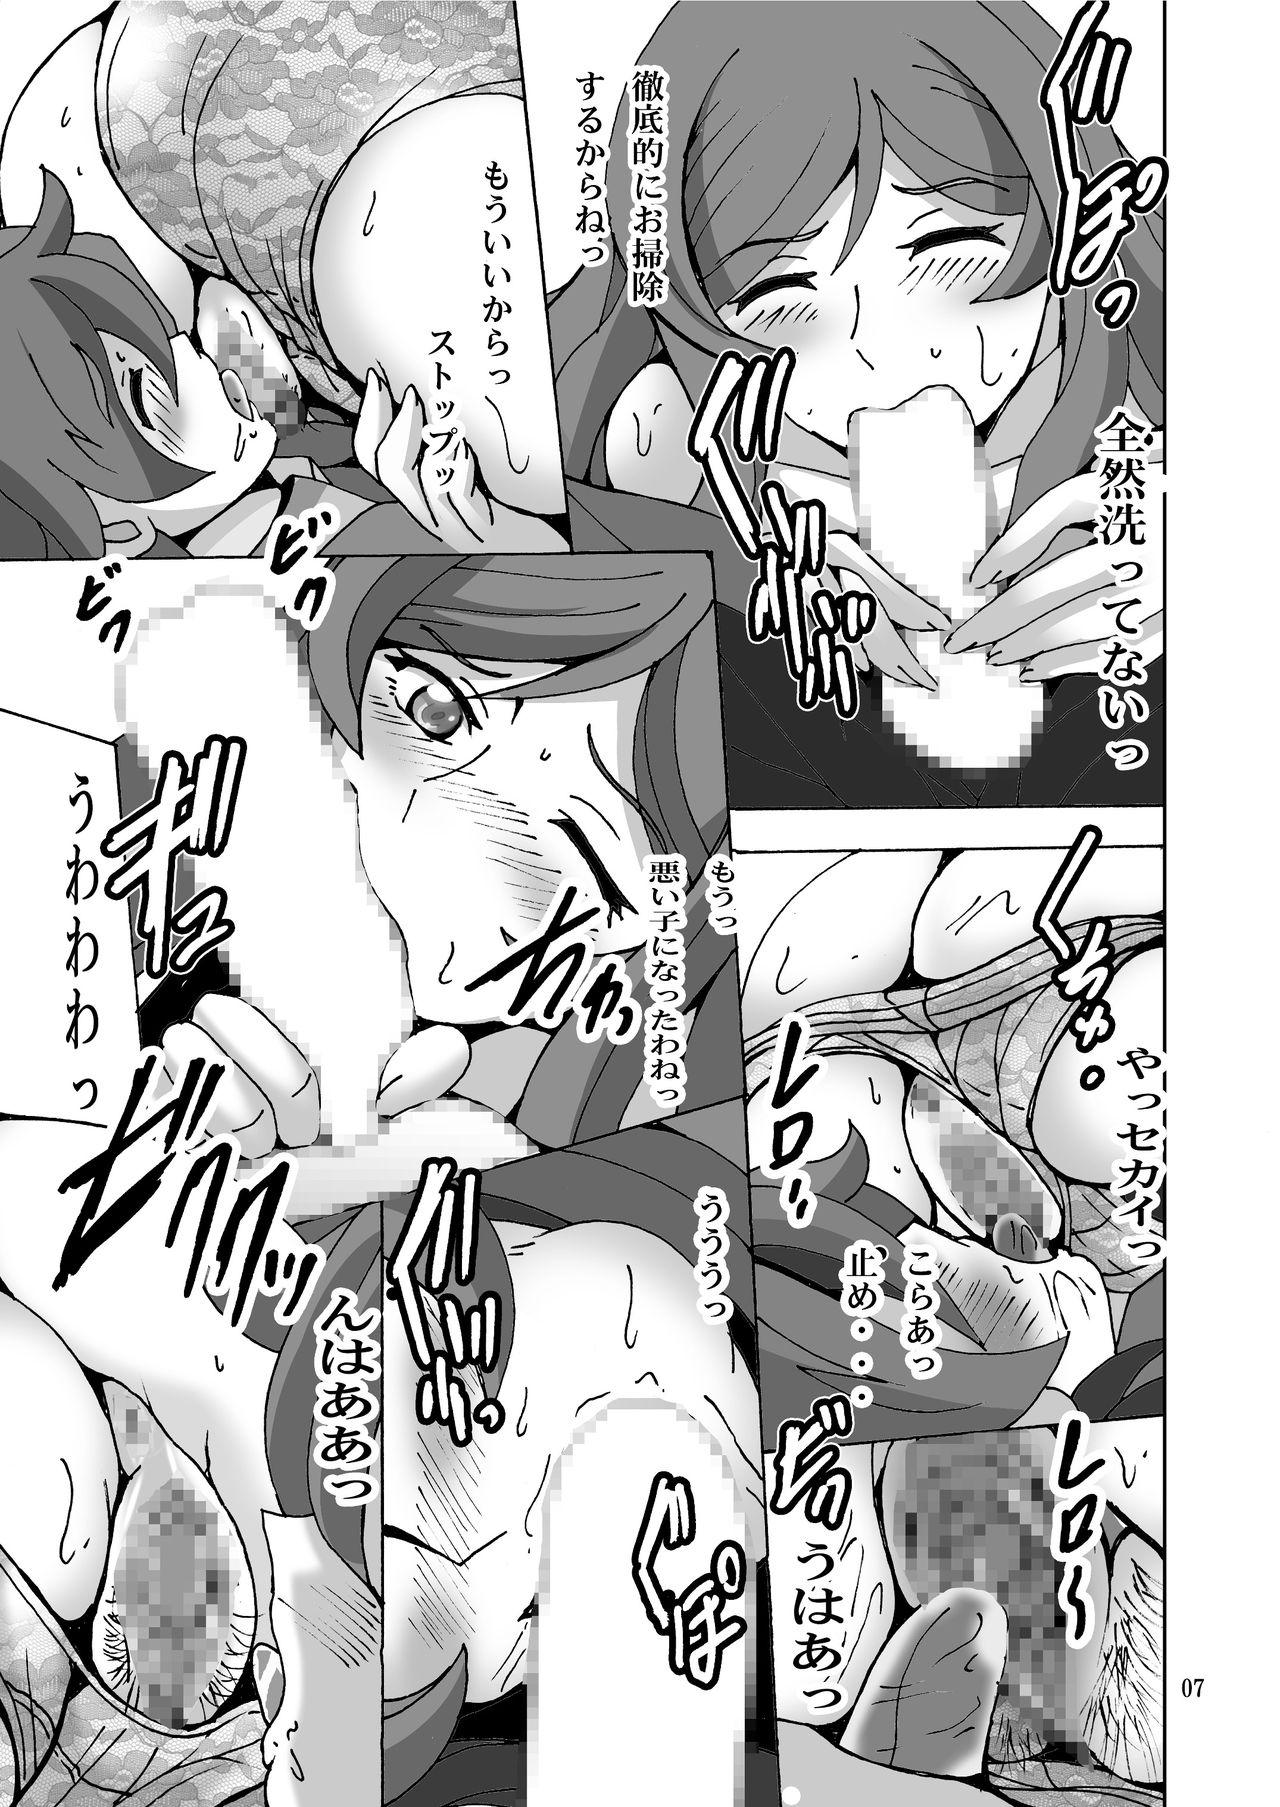 Ganbare! Onee-chan 6